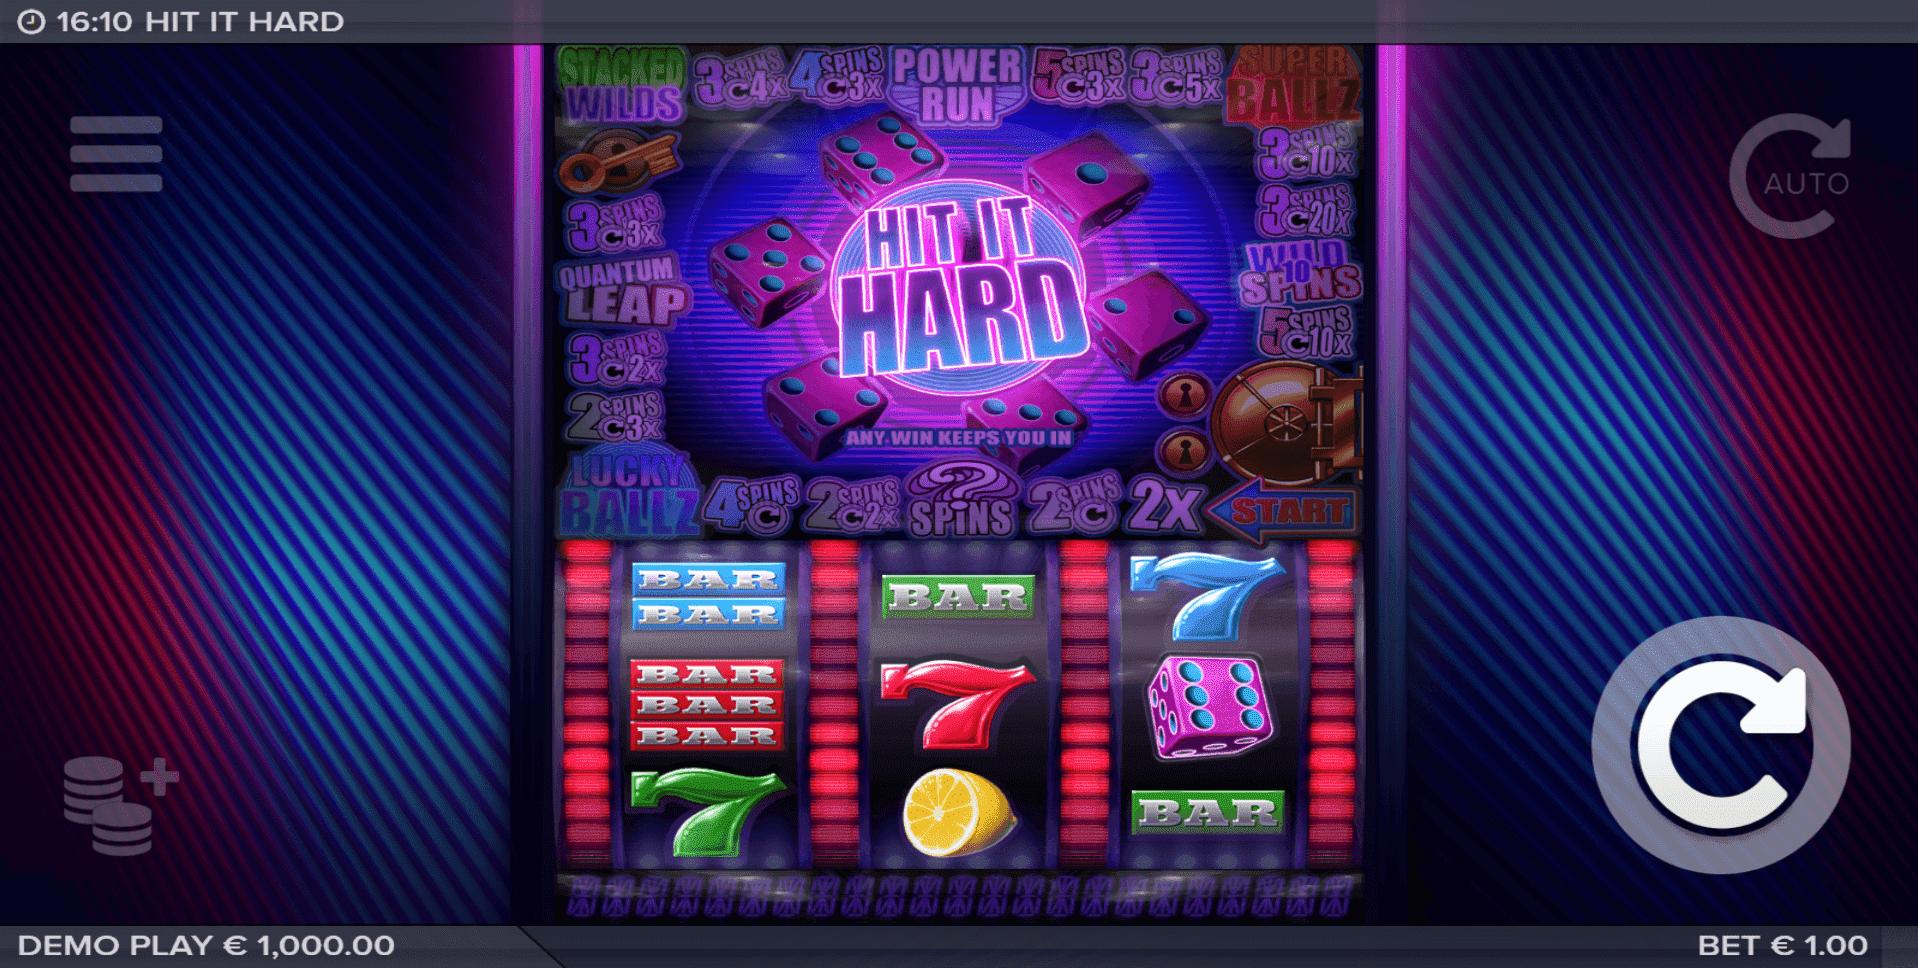 Hit It Hard slot machine screenshot